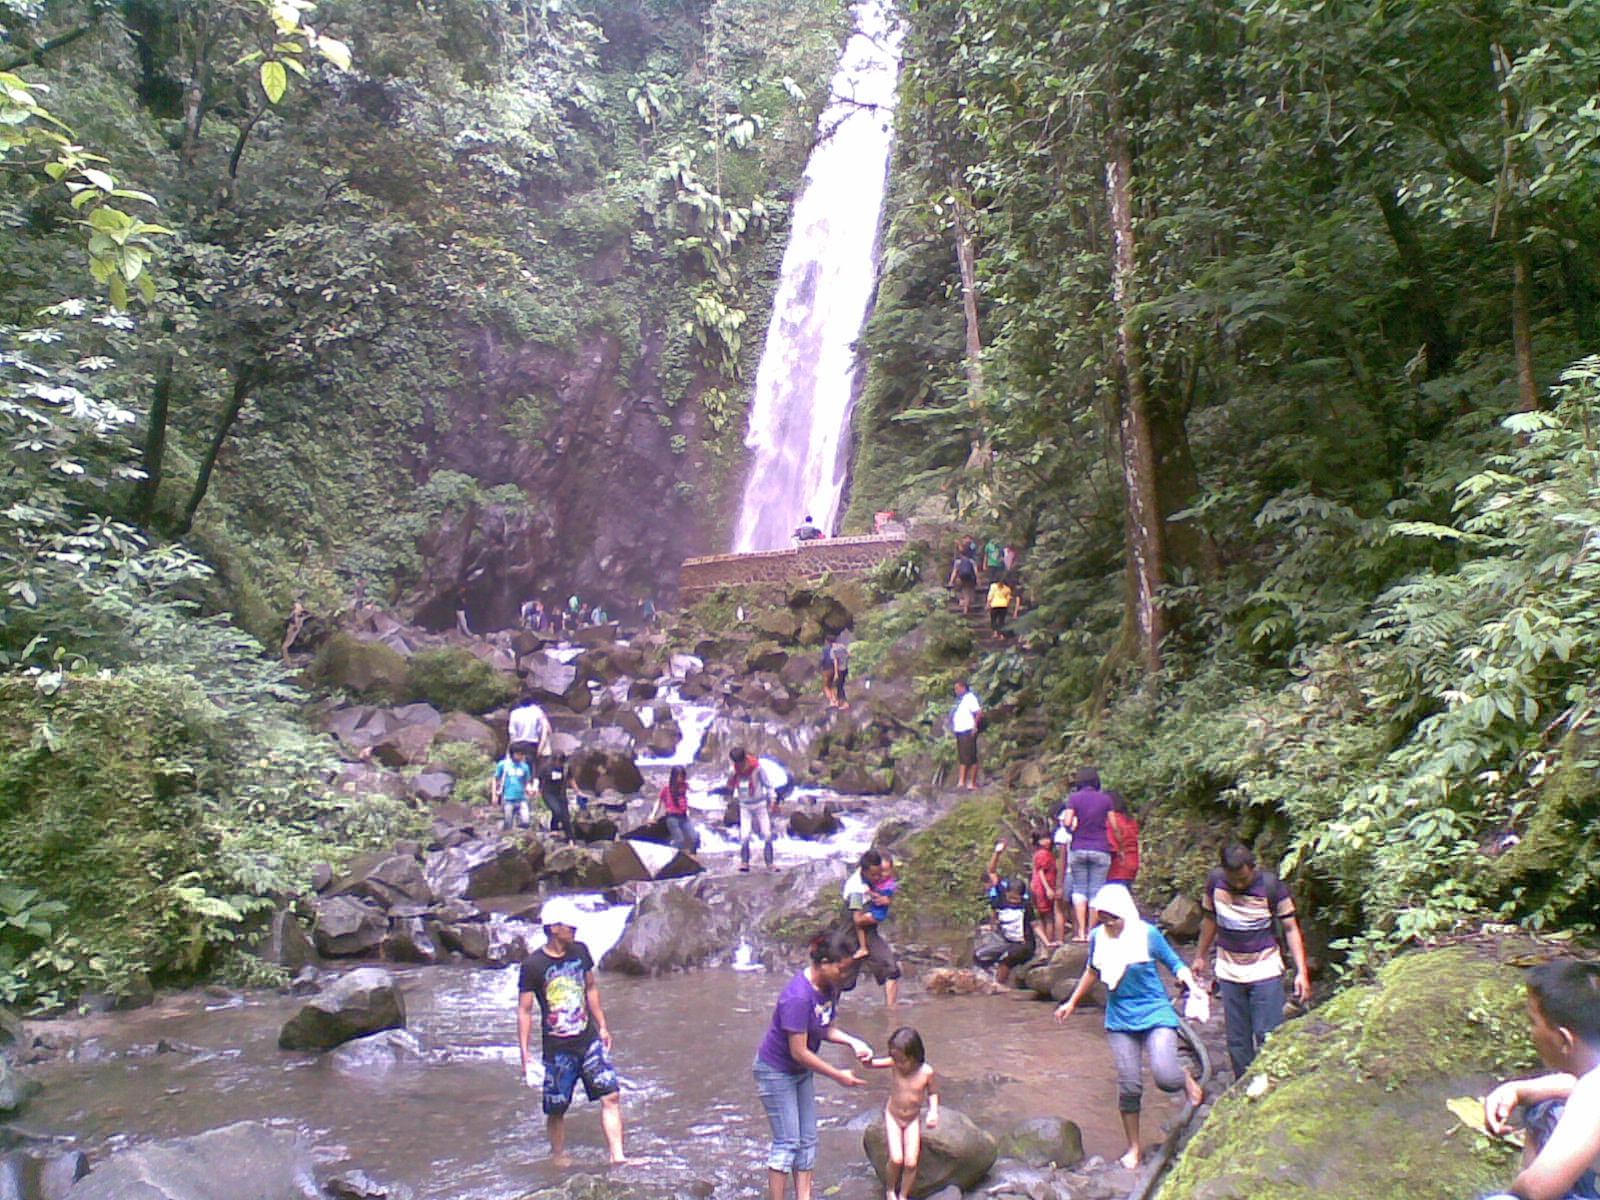 Tempat Wisata Air Terjun Kakek Bodo – Tretes, Pasuruan, Jawa ...